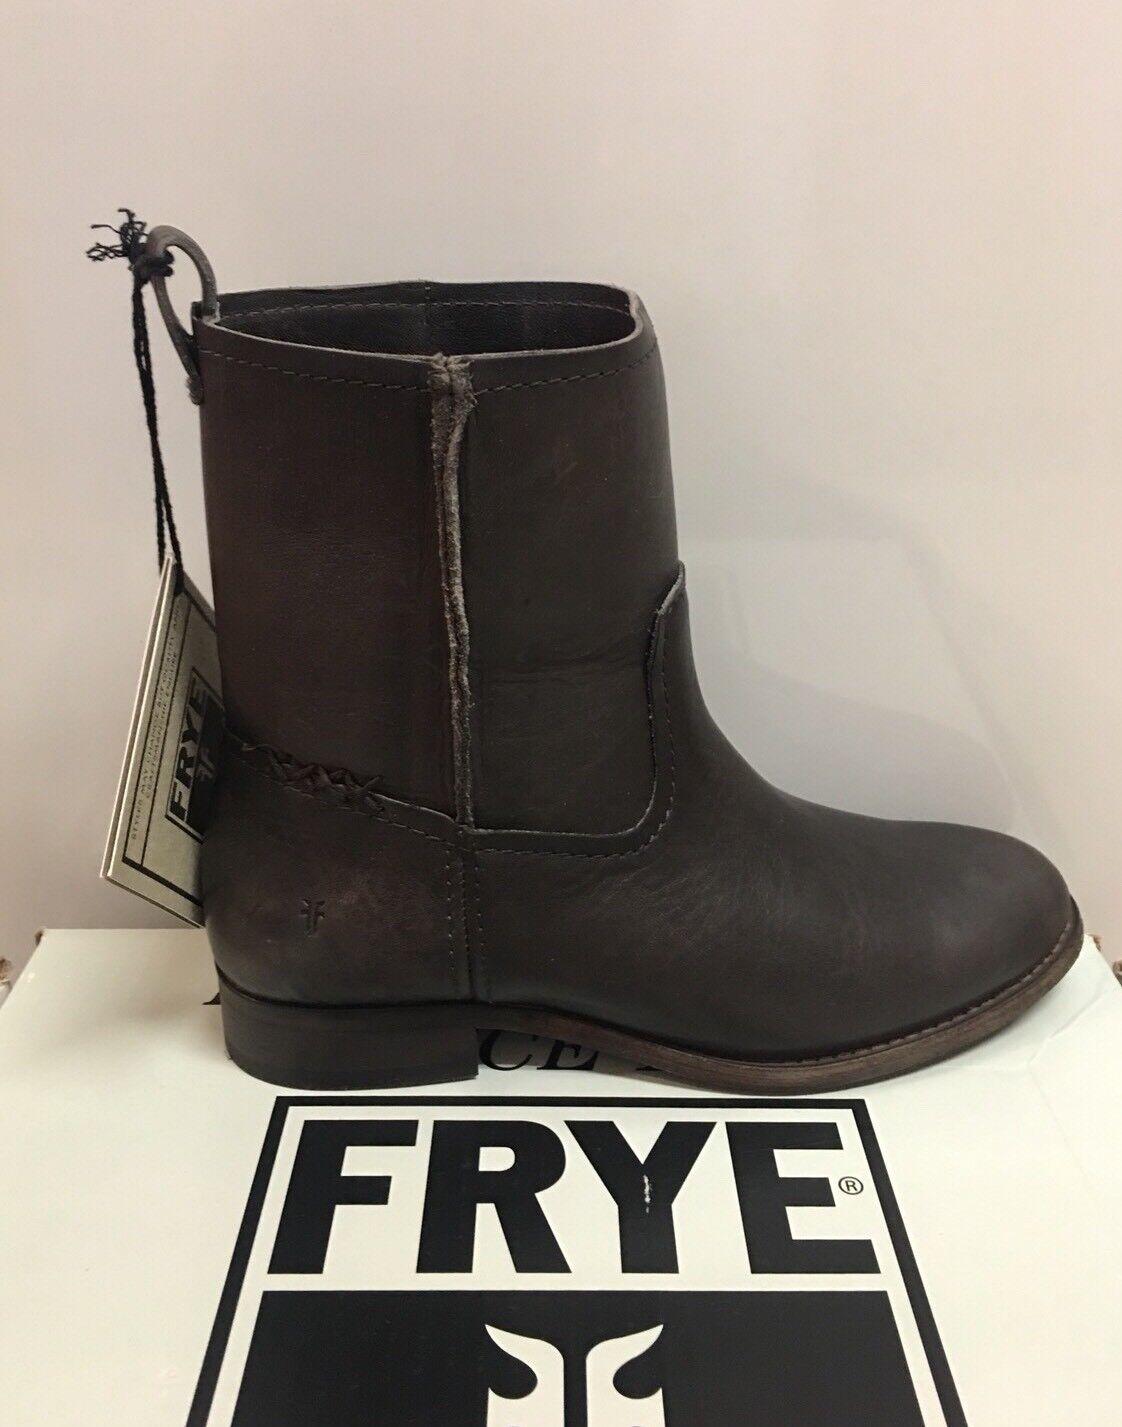 New - Women's Frye Cara Cara Cara Short Smoke Leather Boots Size 7 770d53